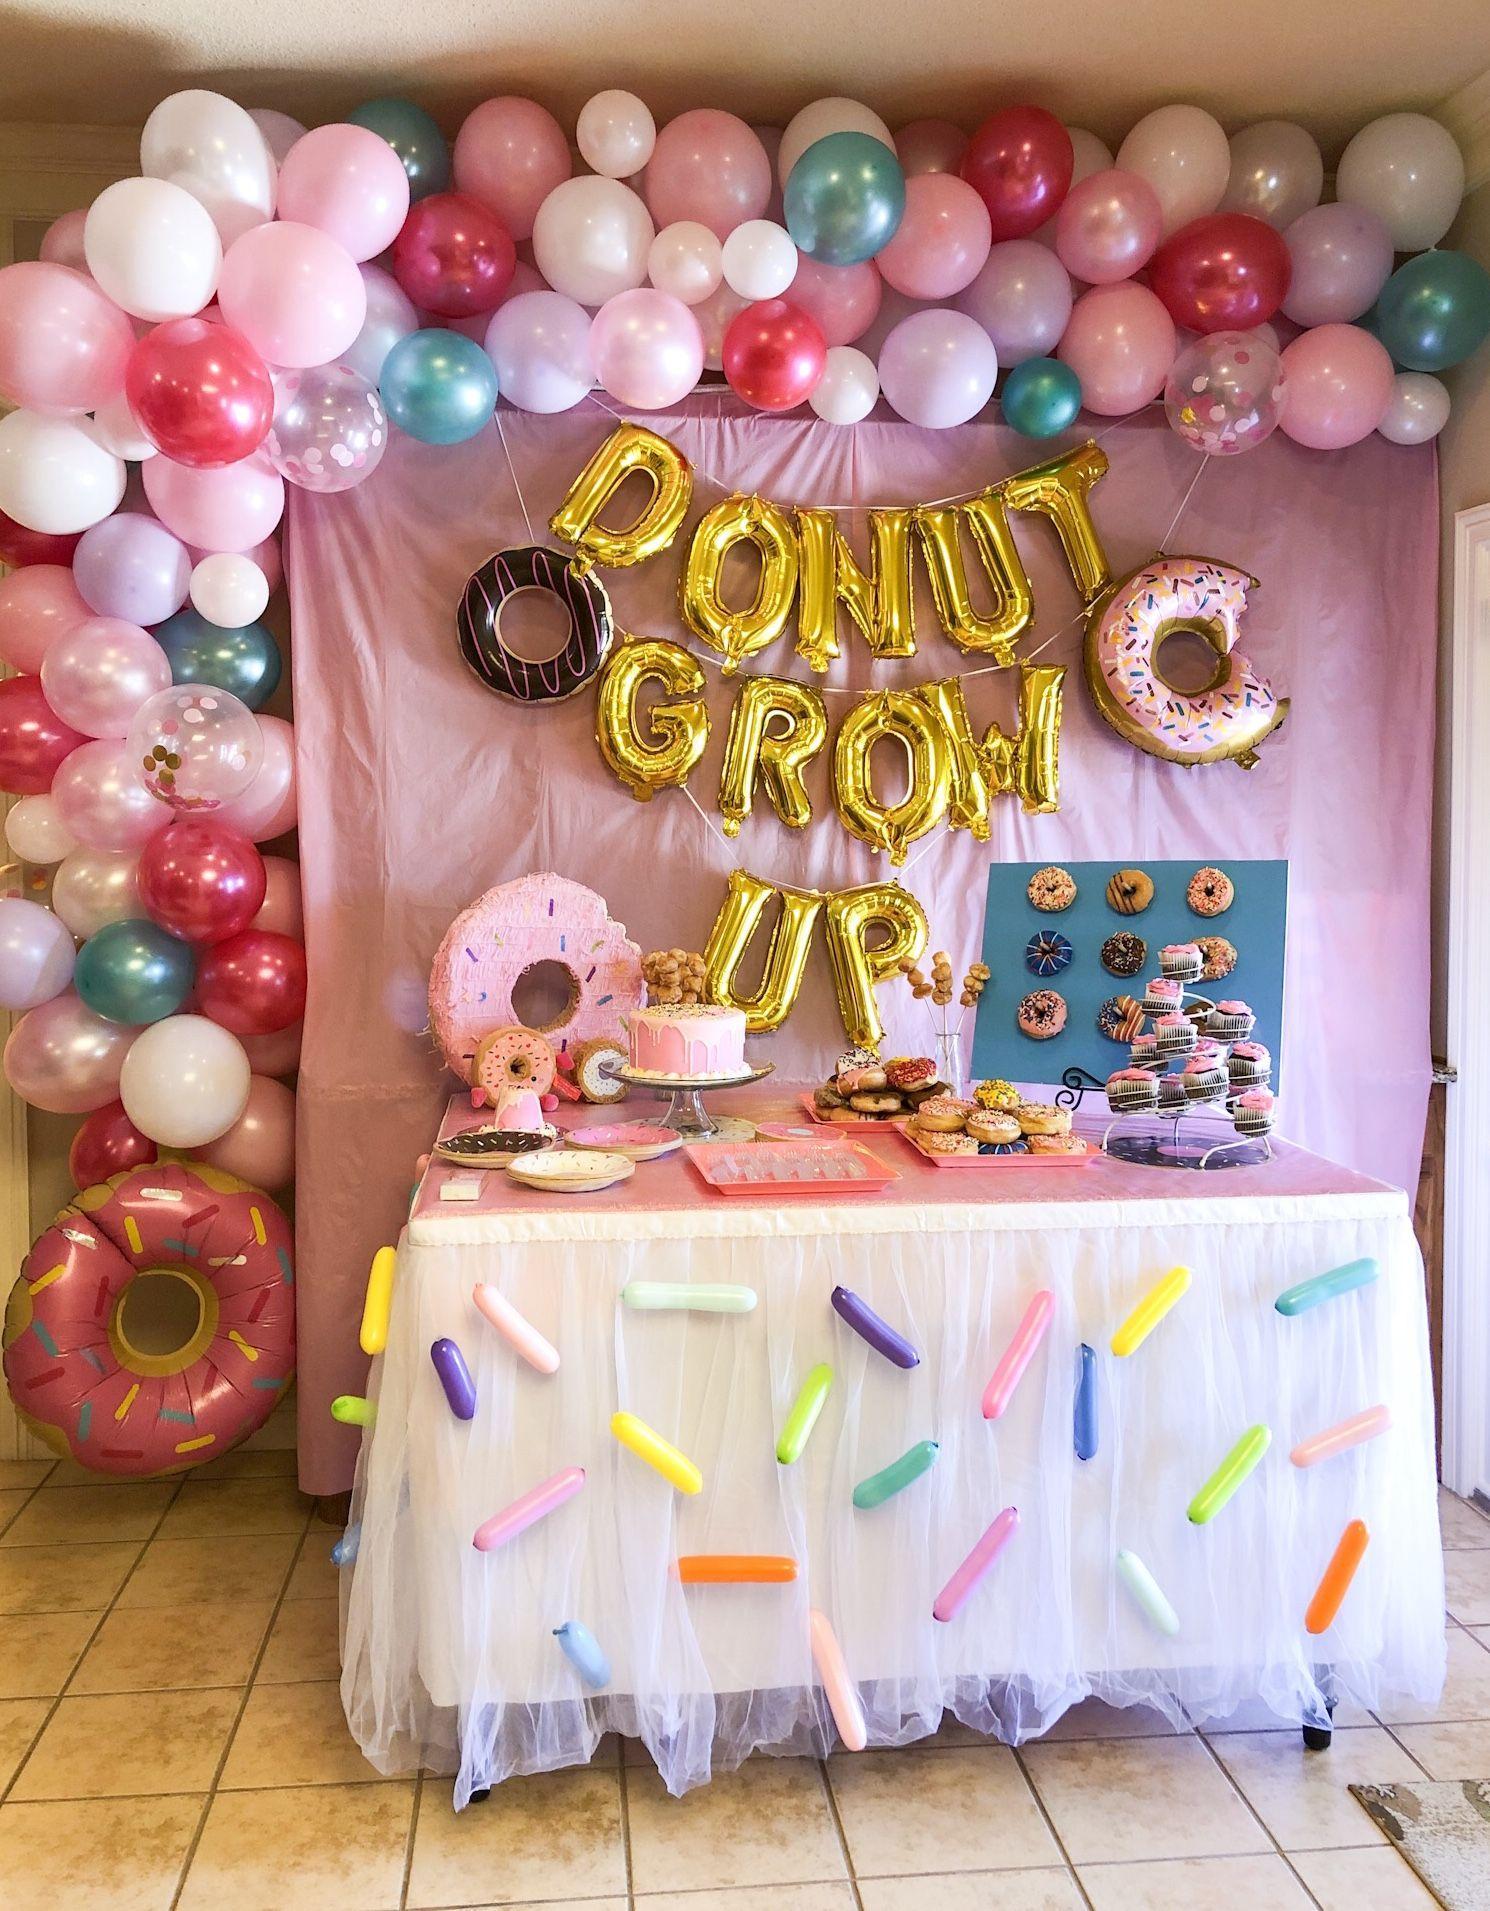 Donut Grow Up Birthday Party Donut Themed Birthday Party Donut Birthday Parties 1st Birthday Balloons